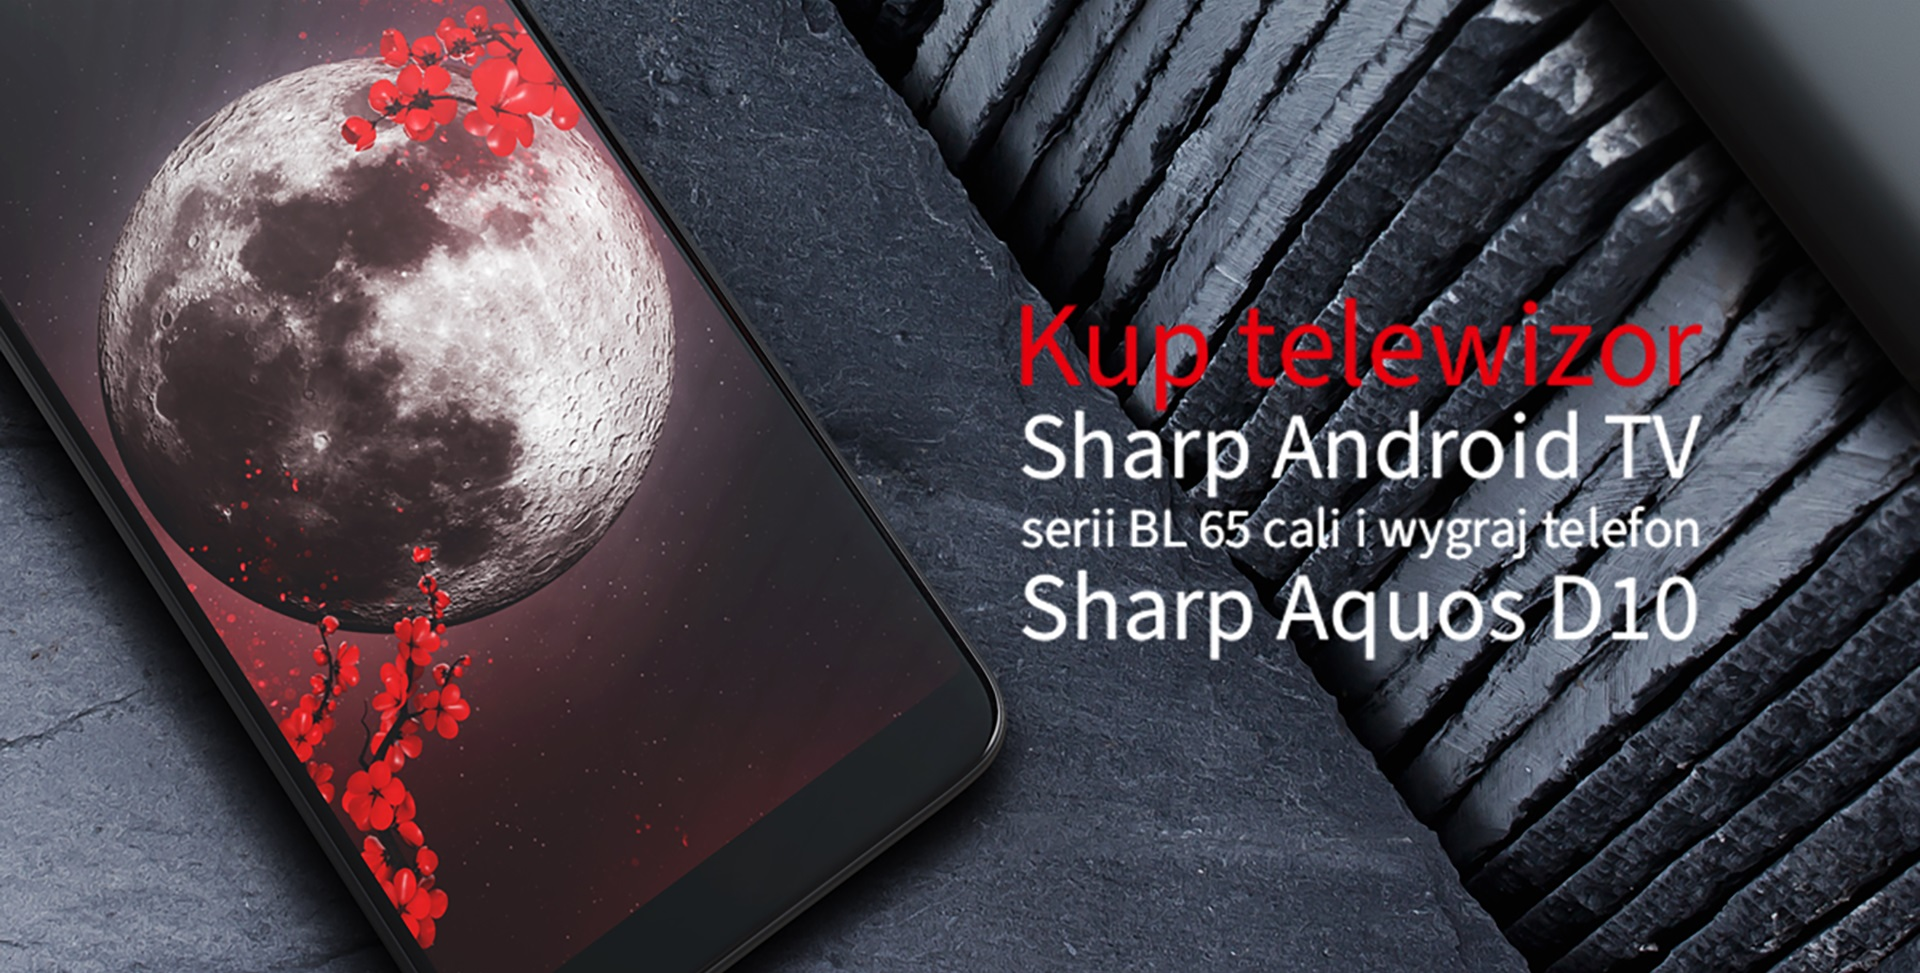 Promocja: kup telewizor Sharp, a dostaniesz smartfon i... drugi telewizor 18